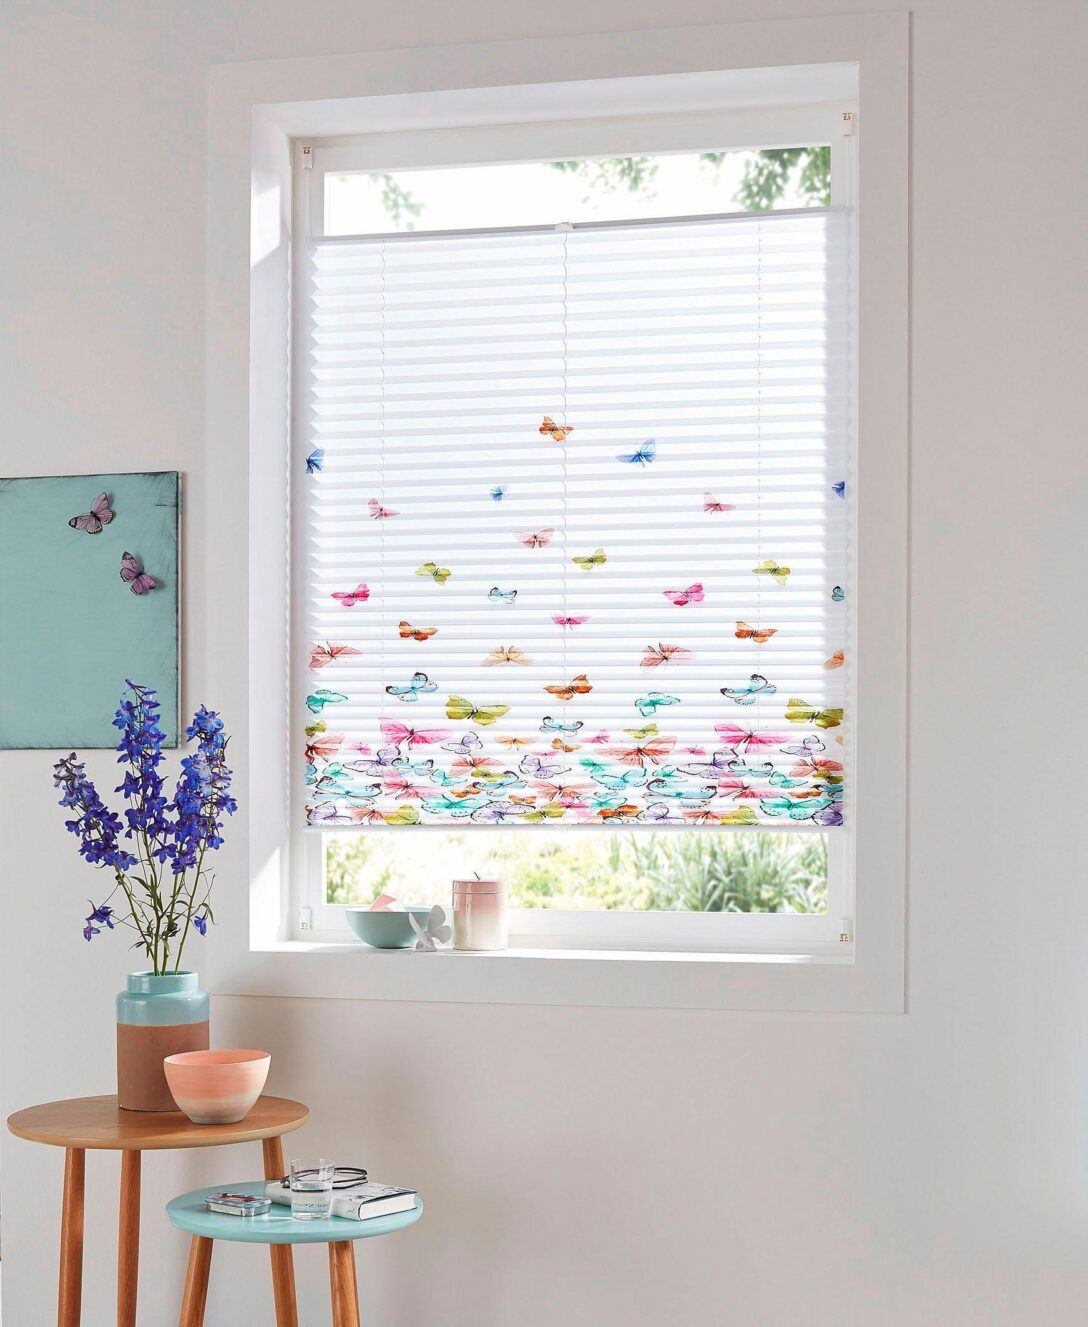 Large Size of Plissee Fenster Regale Kinderzimmer Regal Weiß Sofa Kinderzimmer Plissee Kinderzimmer